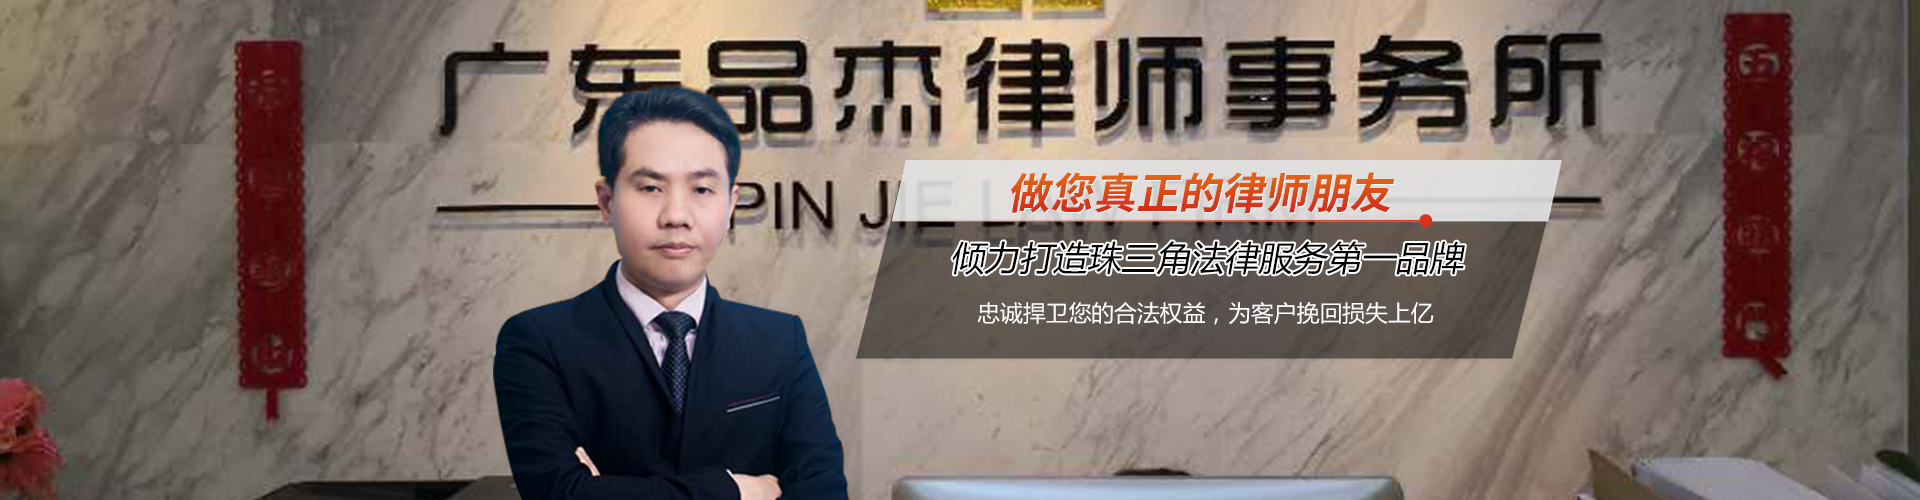 陈宏圆律师